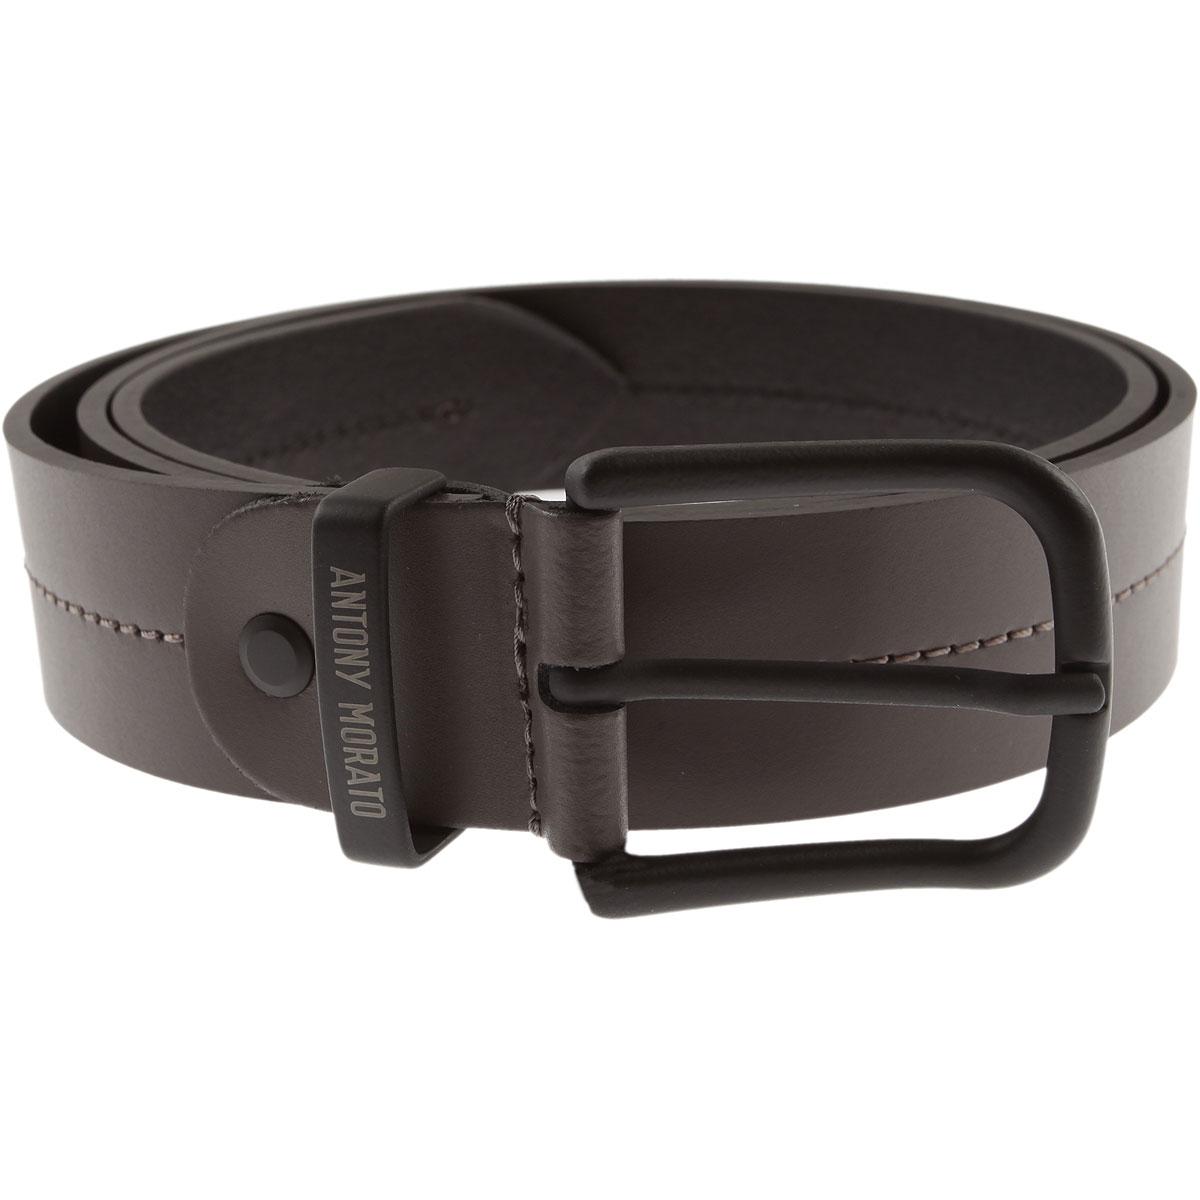 Image of Antony Morato Belts, london grey, Leather, 2017, S M L XL